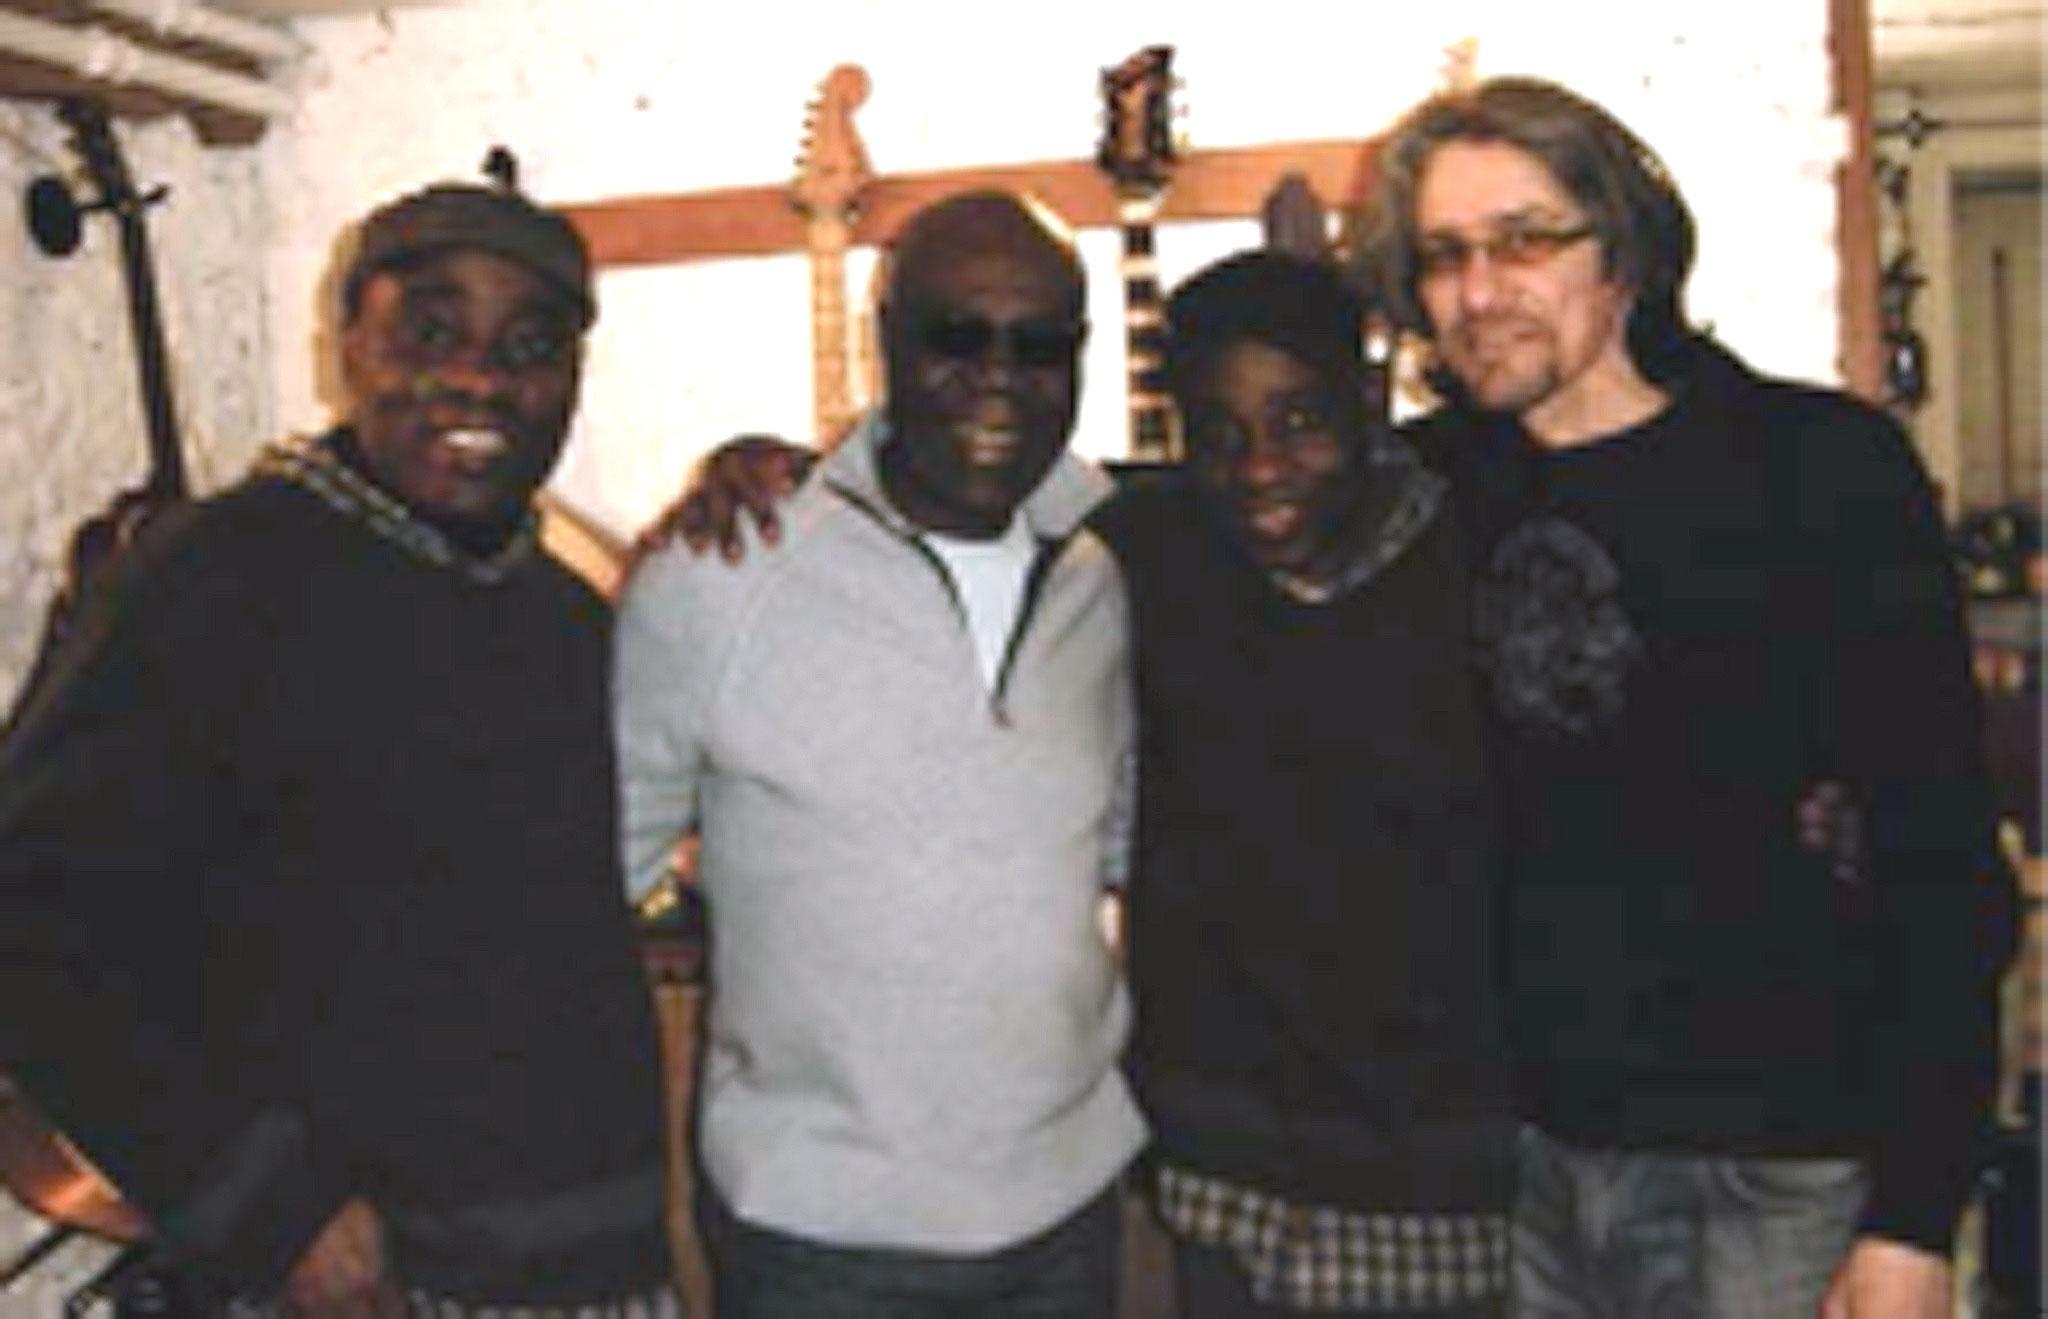 Les Jumeaux de MASAO (Masao Masu) en studio avec Manu Dibango et l'arrengeur guitariste Phil Robert